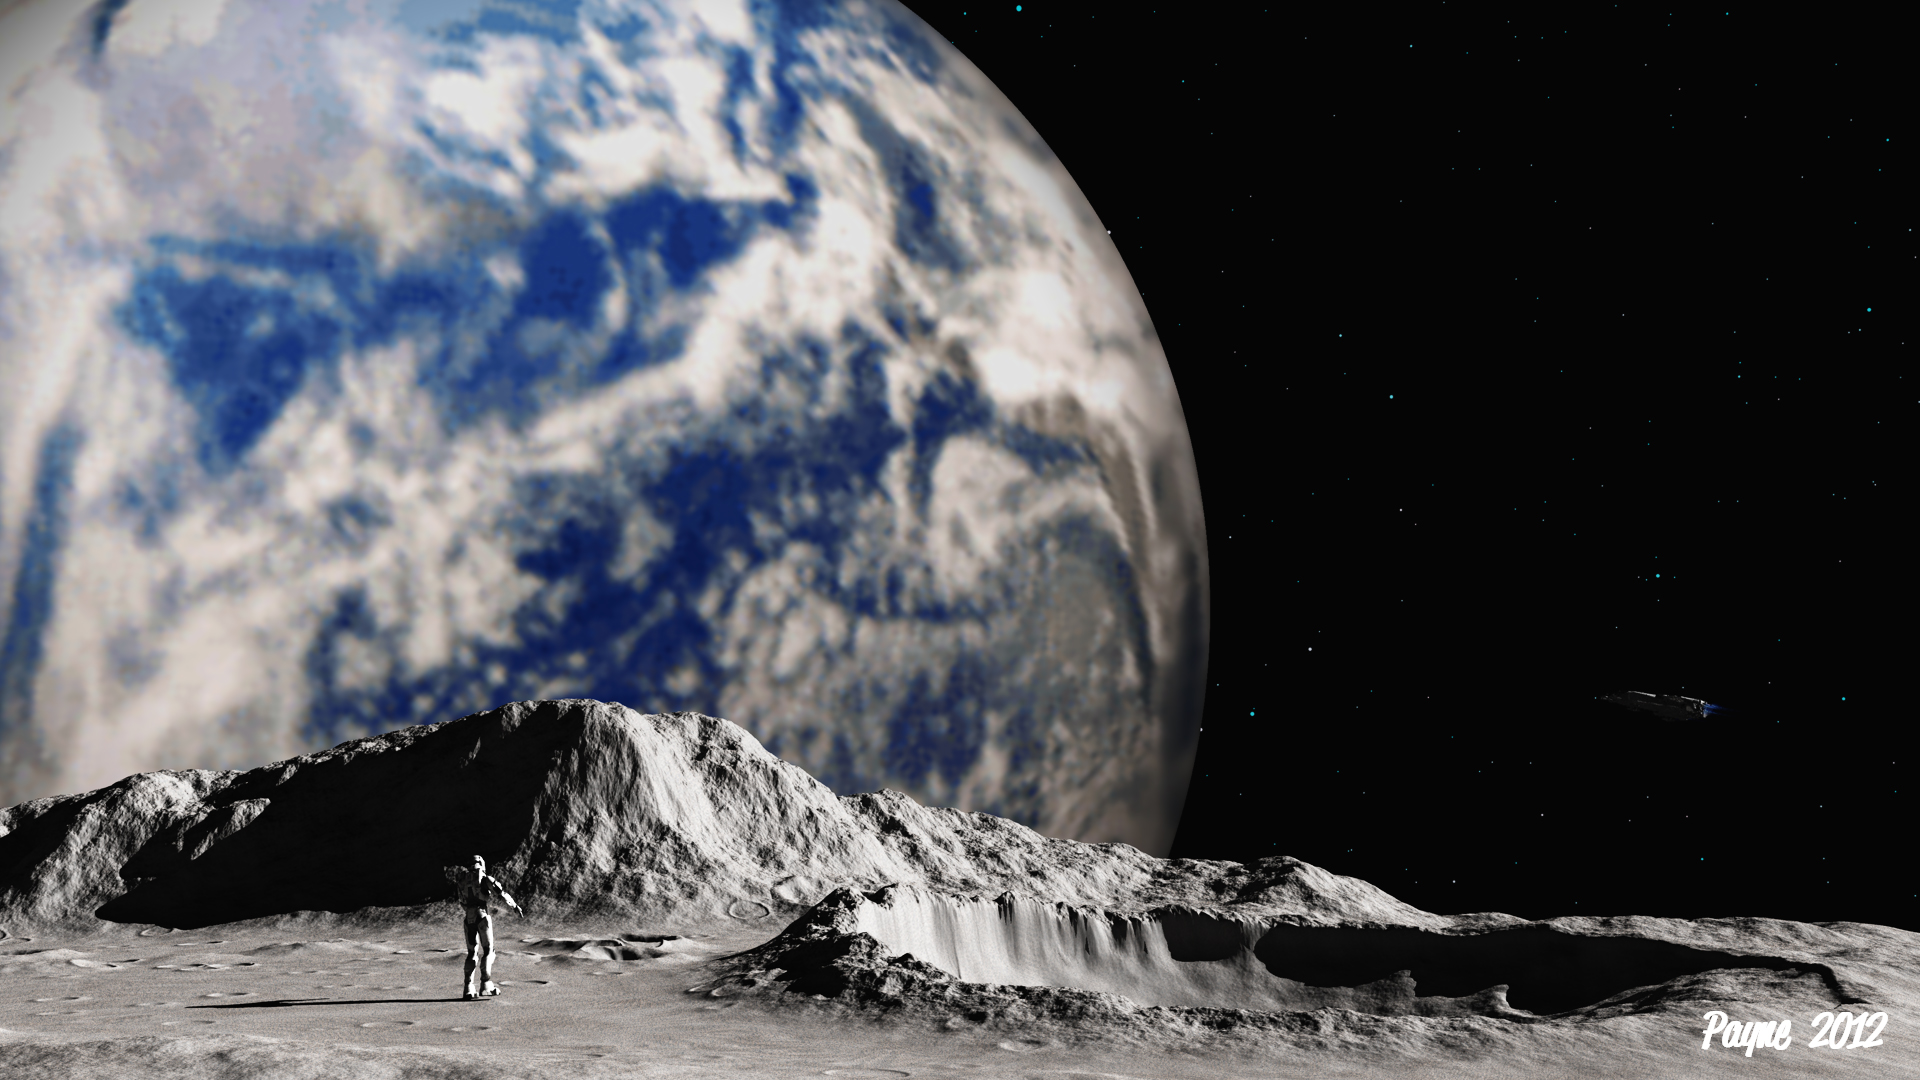 Free Download Source Httplance66deviantartcomartman On The Moon